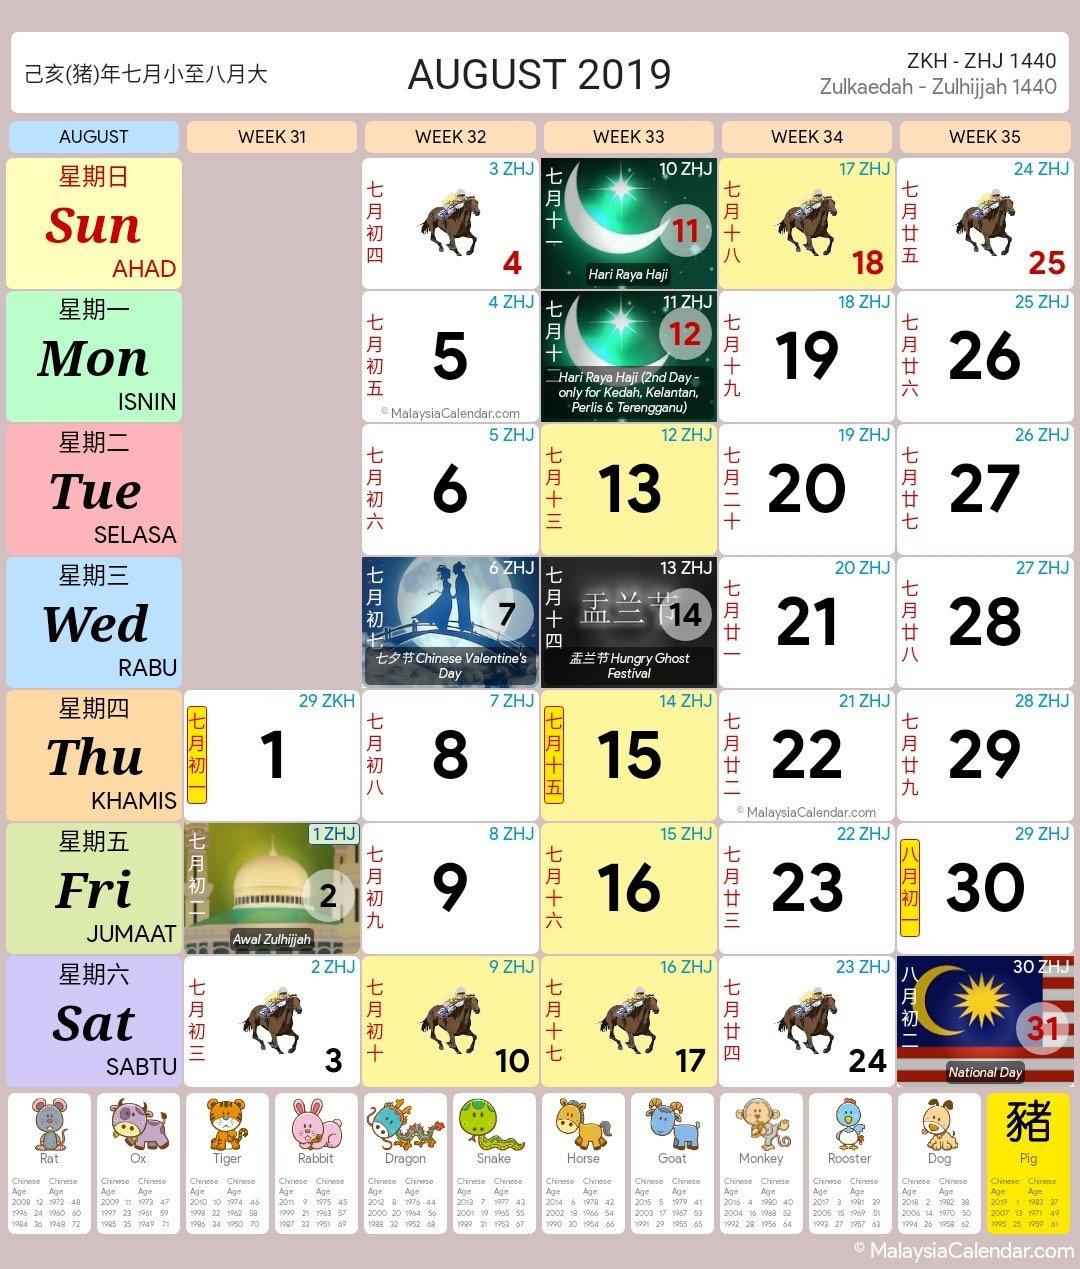 Malaysia Calendar Year 2019 (School Holiday) - Malaysia Calendar Calendar 2019 Malaysia